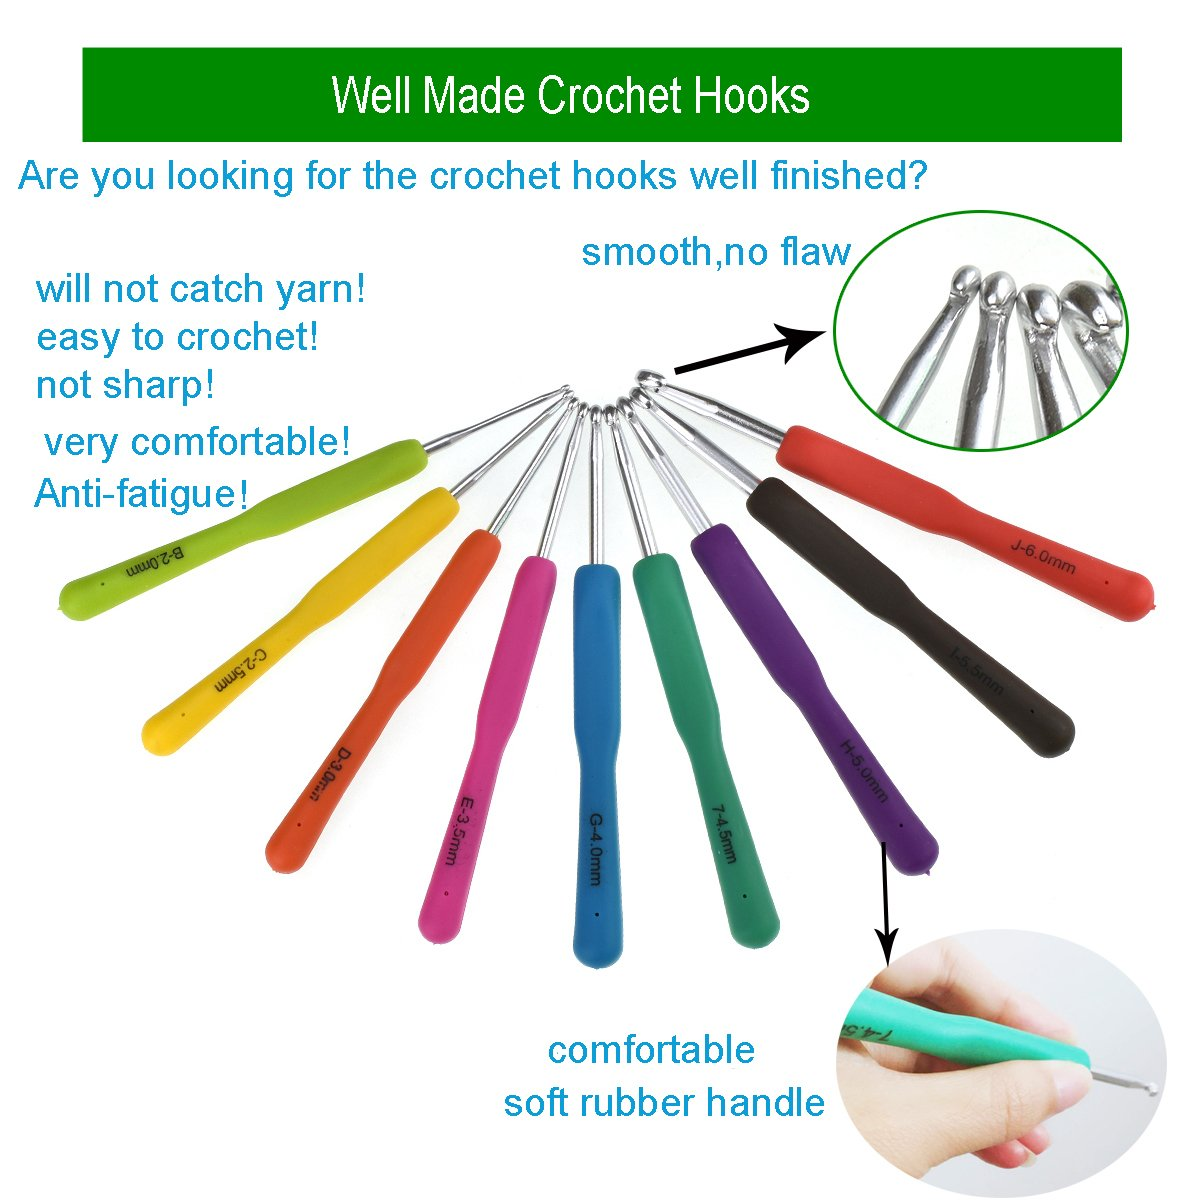 New Set of 47 Ergonomic Crochet Hooks Set w Rubbery Handles Hook 0.6-6MM, Comfort Grip for Arthritic Hands by LOOEN (Image #3)